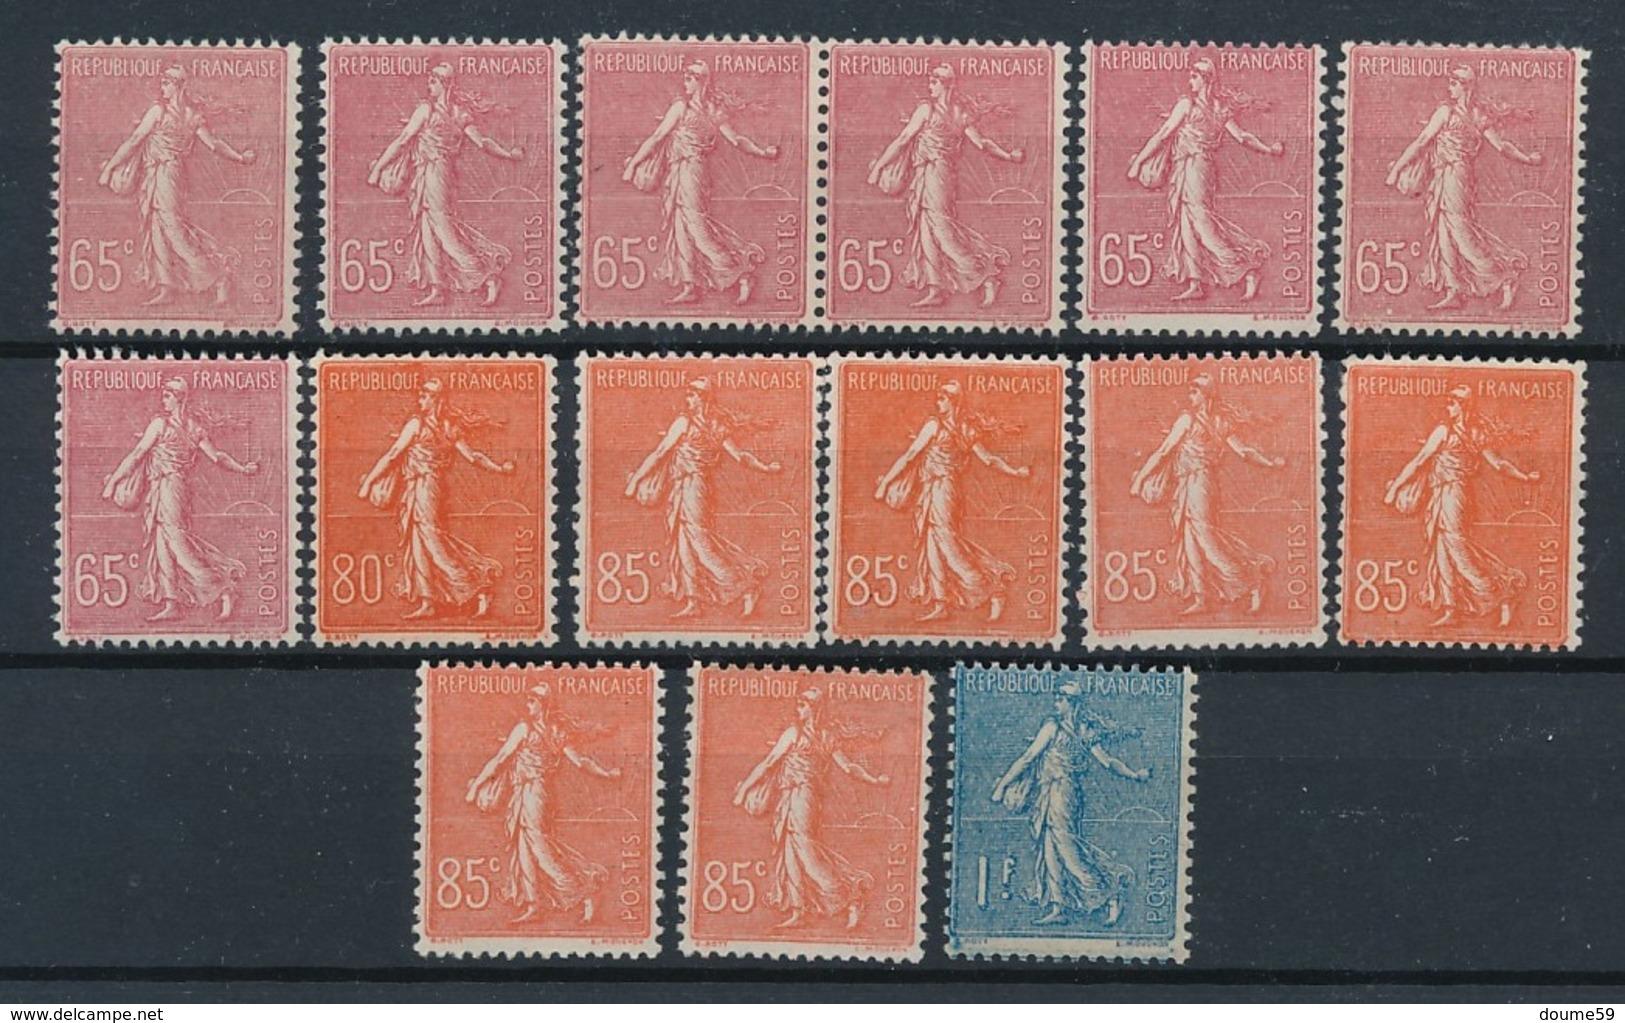 CP-421: FRANCE: Lot De Timbres Neufs ** N°201(7)-203-204(6)-205 - 1903-60 Sower - Ligned